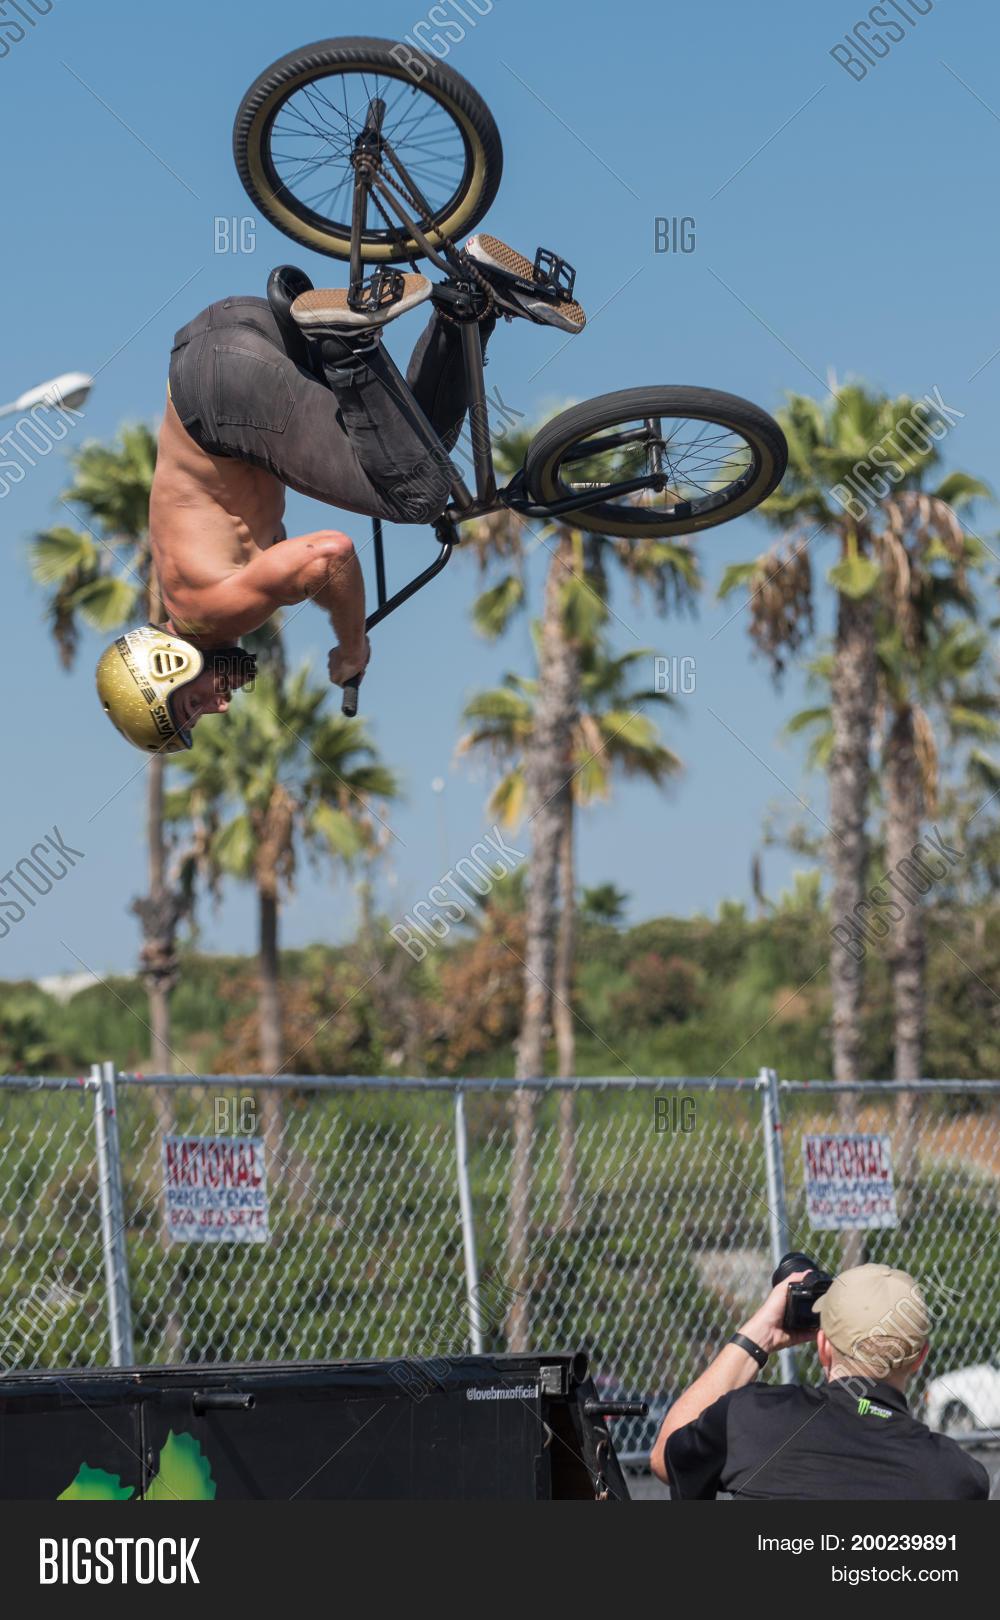 Bmx Rider Making Bike Image & Photo (Free Trial) | Bigstock